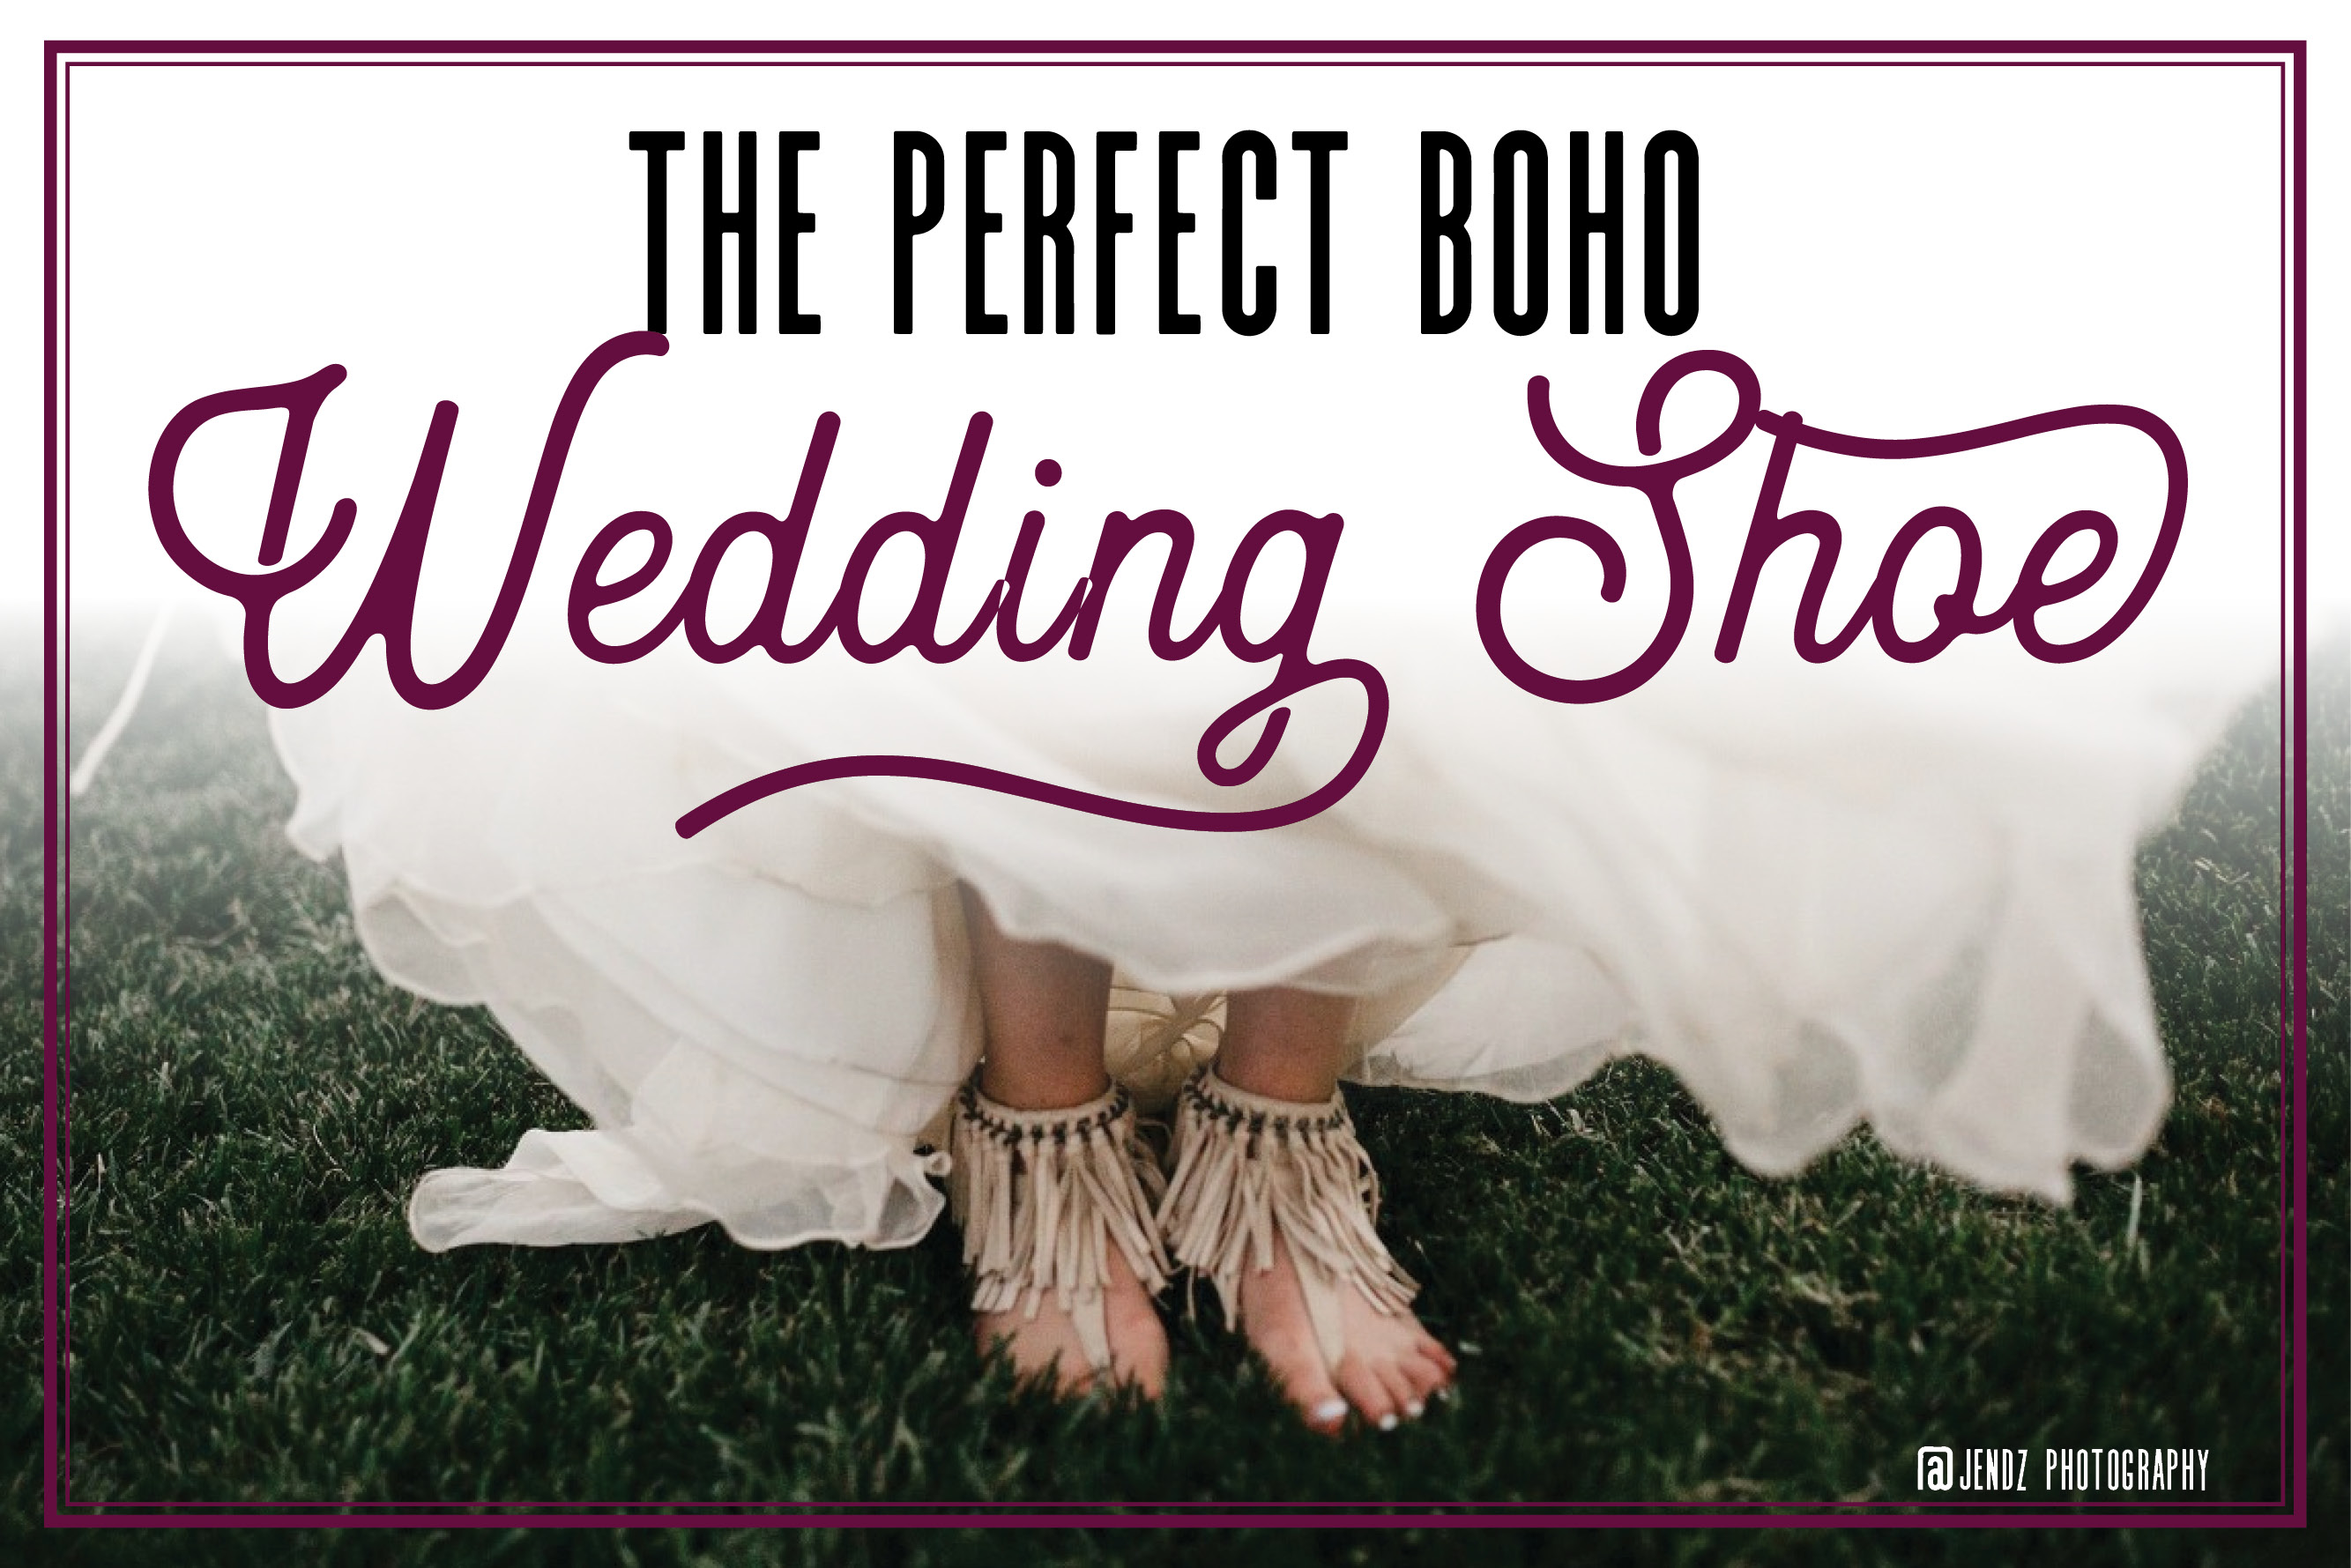 The Perfect Boho Wedding Shoe